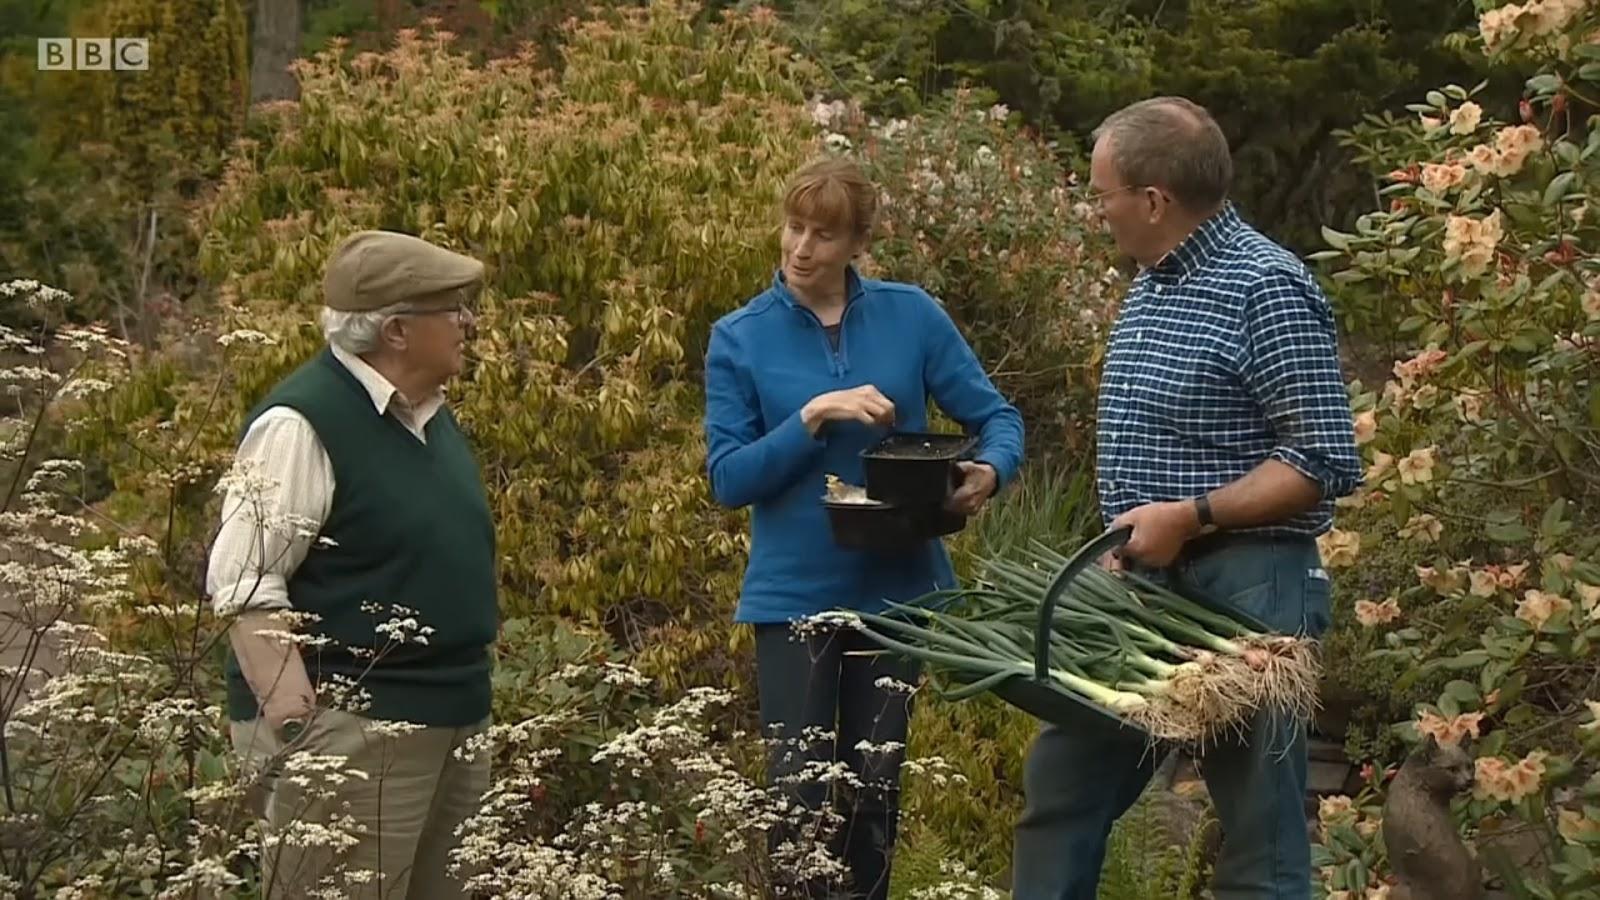 Gardening and Cooking: gardentips